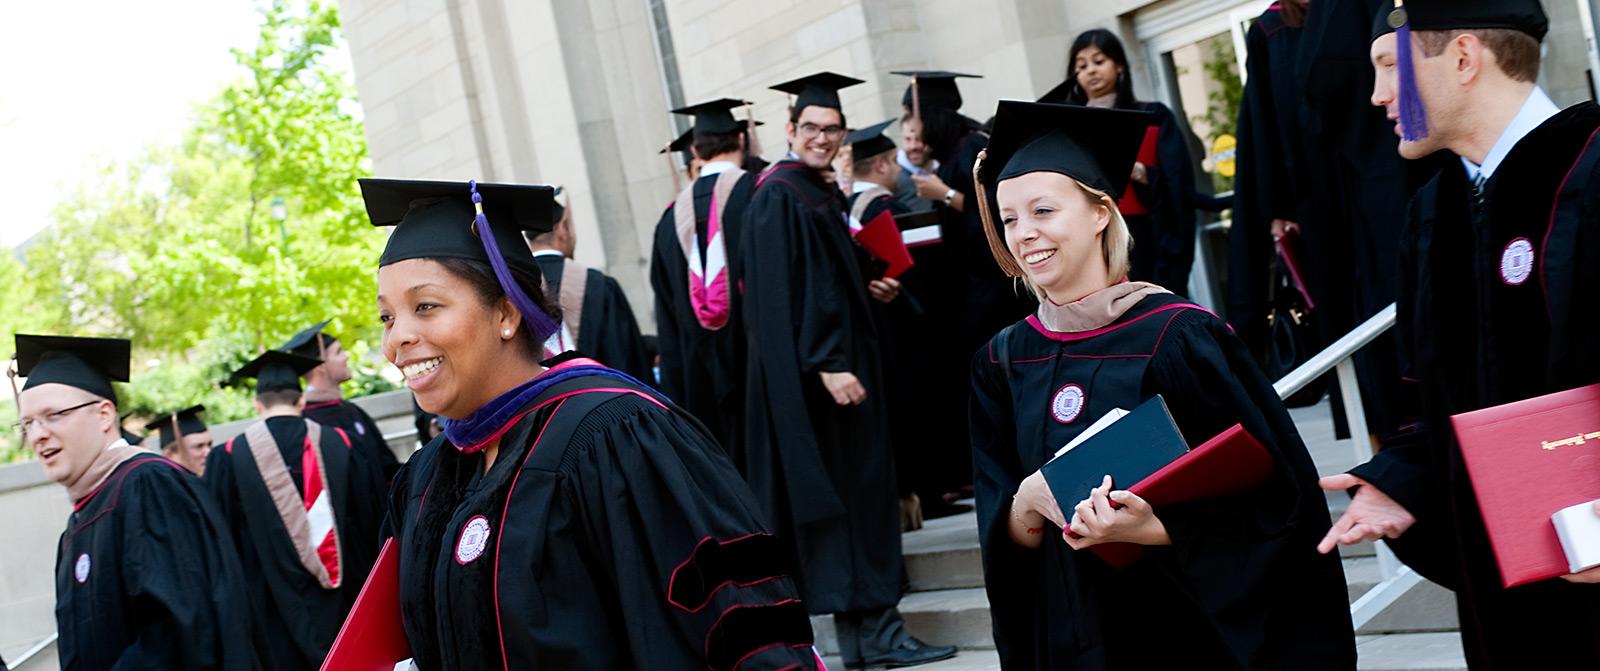 Iu Bloomington Graduation 2020.Graduation Student Life Kelley Direct Online Programs